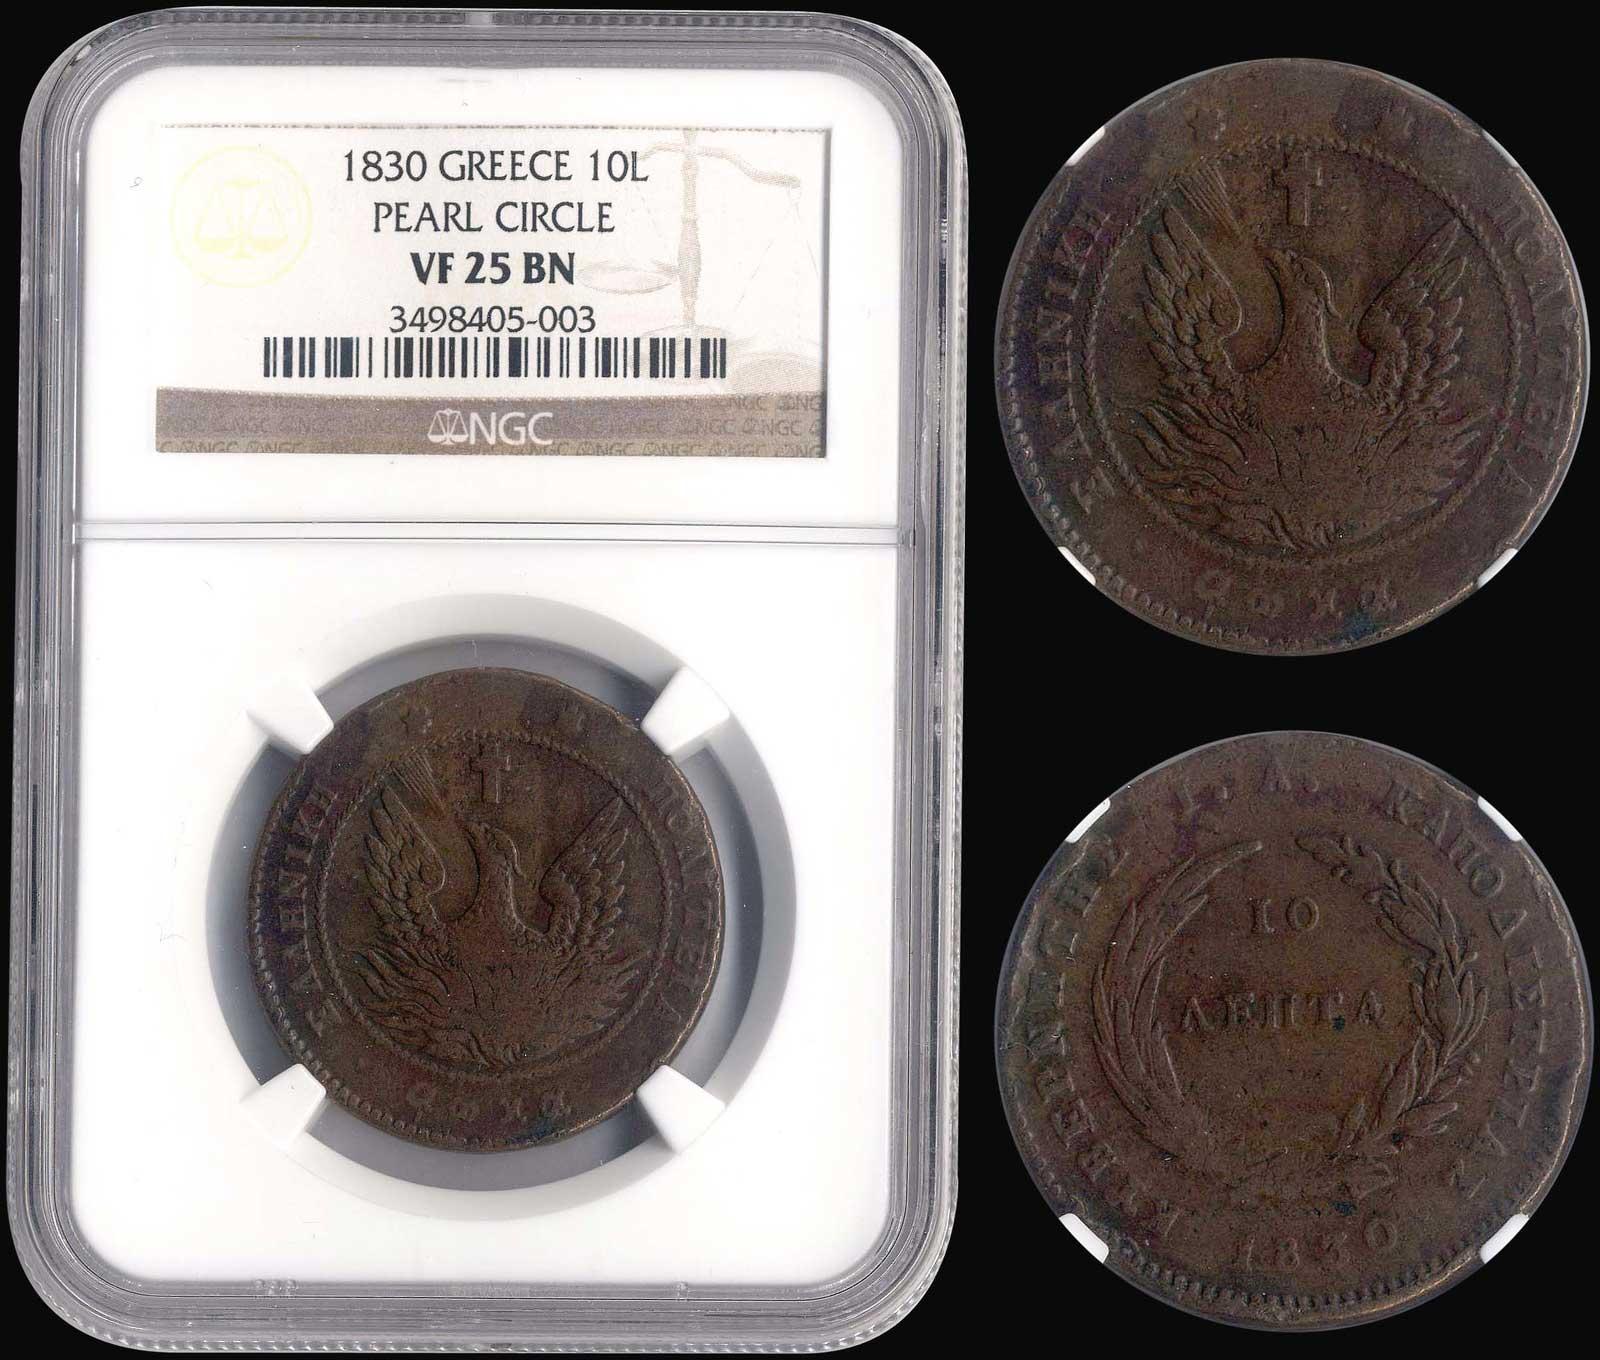 Lot 6017 - GREECE-  COINS & TOKENS governor capodistrias -  A. Karamitsos Public & LIVE Bid Auction 588 Coins, Medals & Banknotes